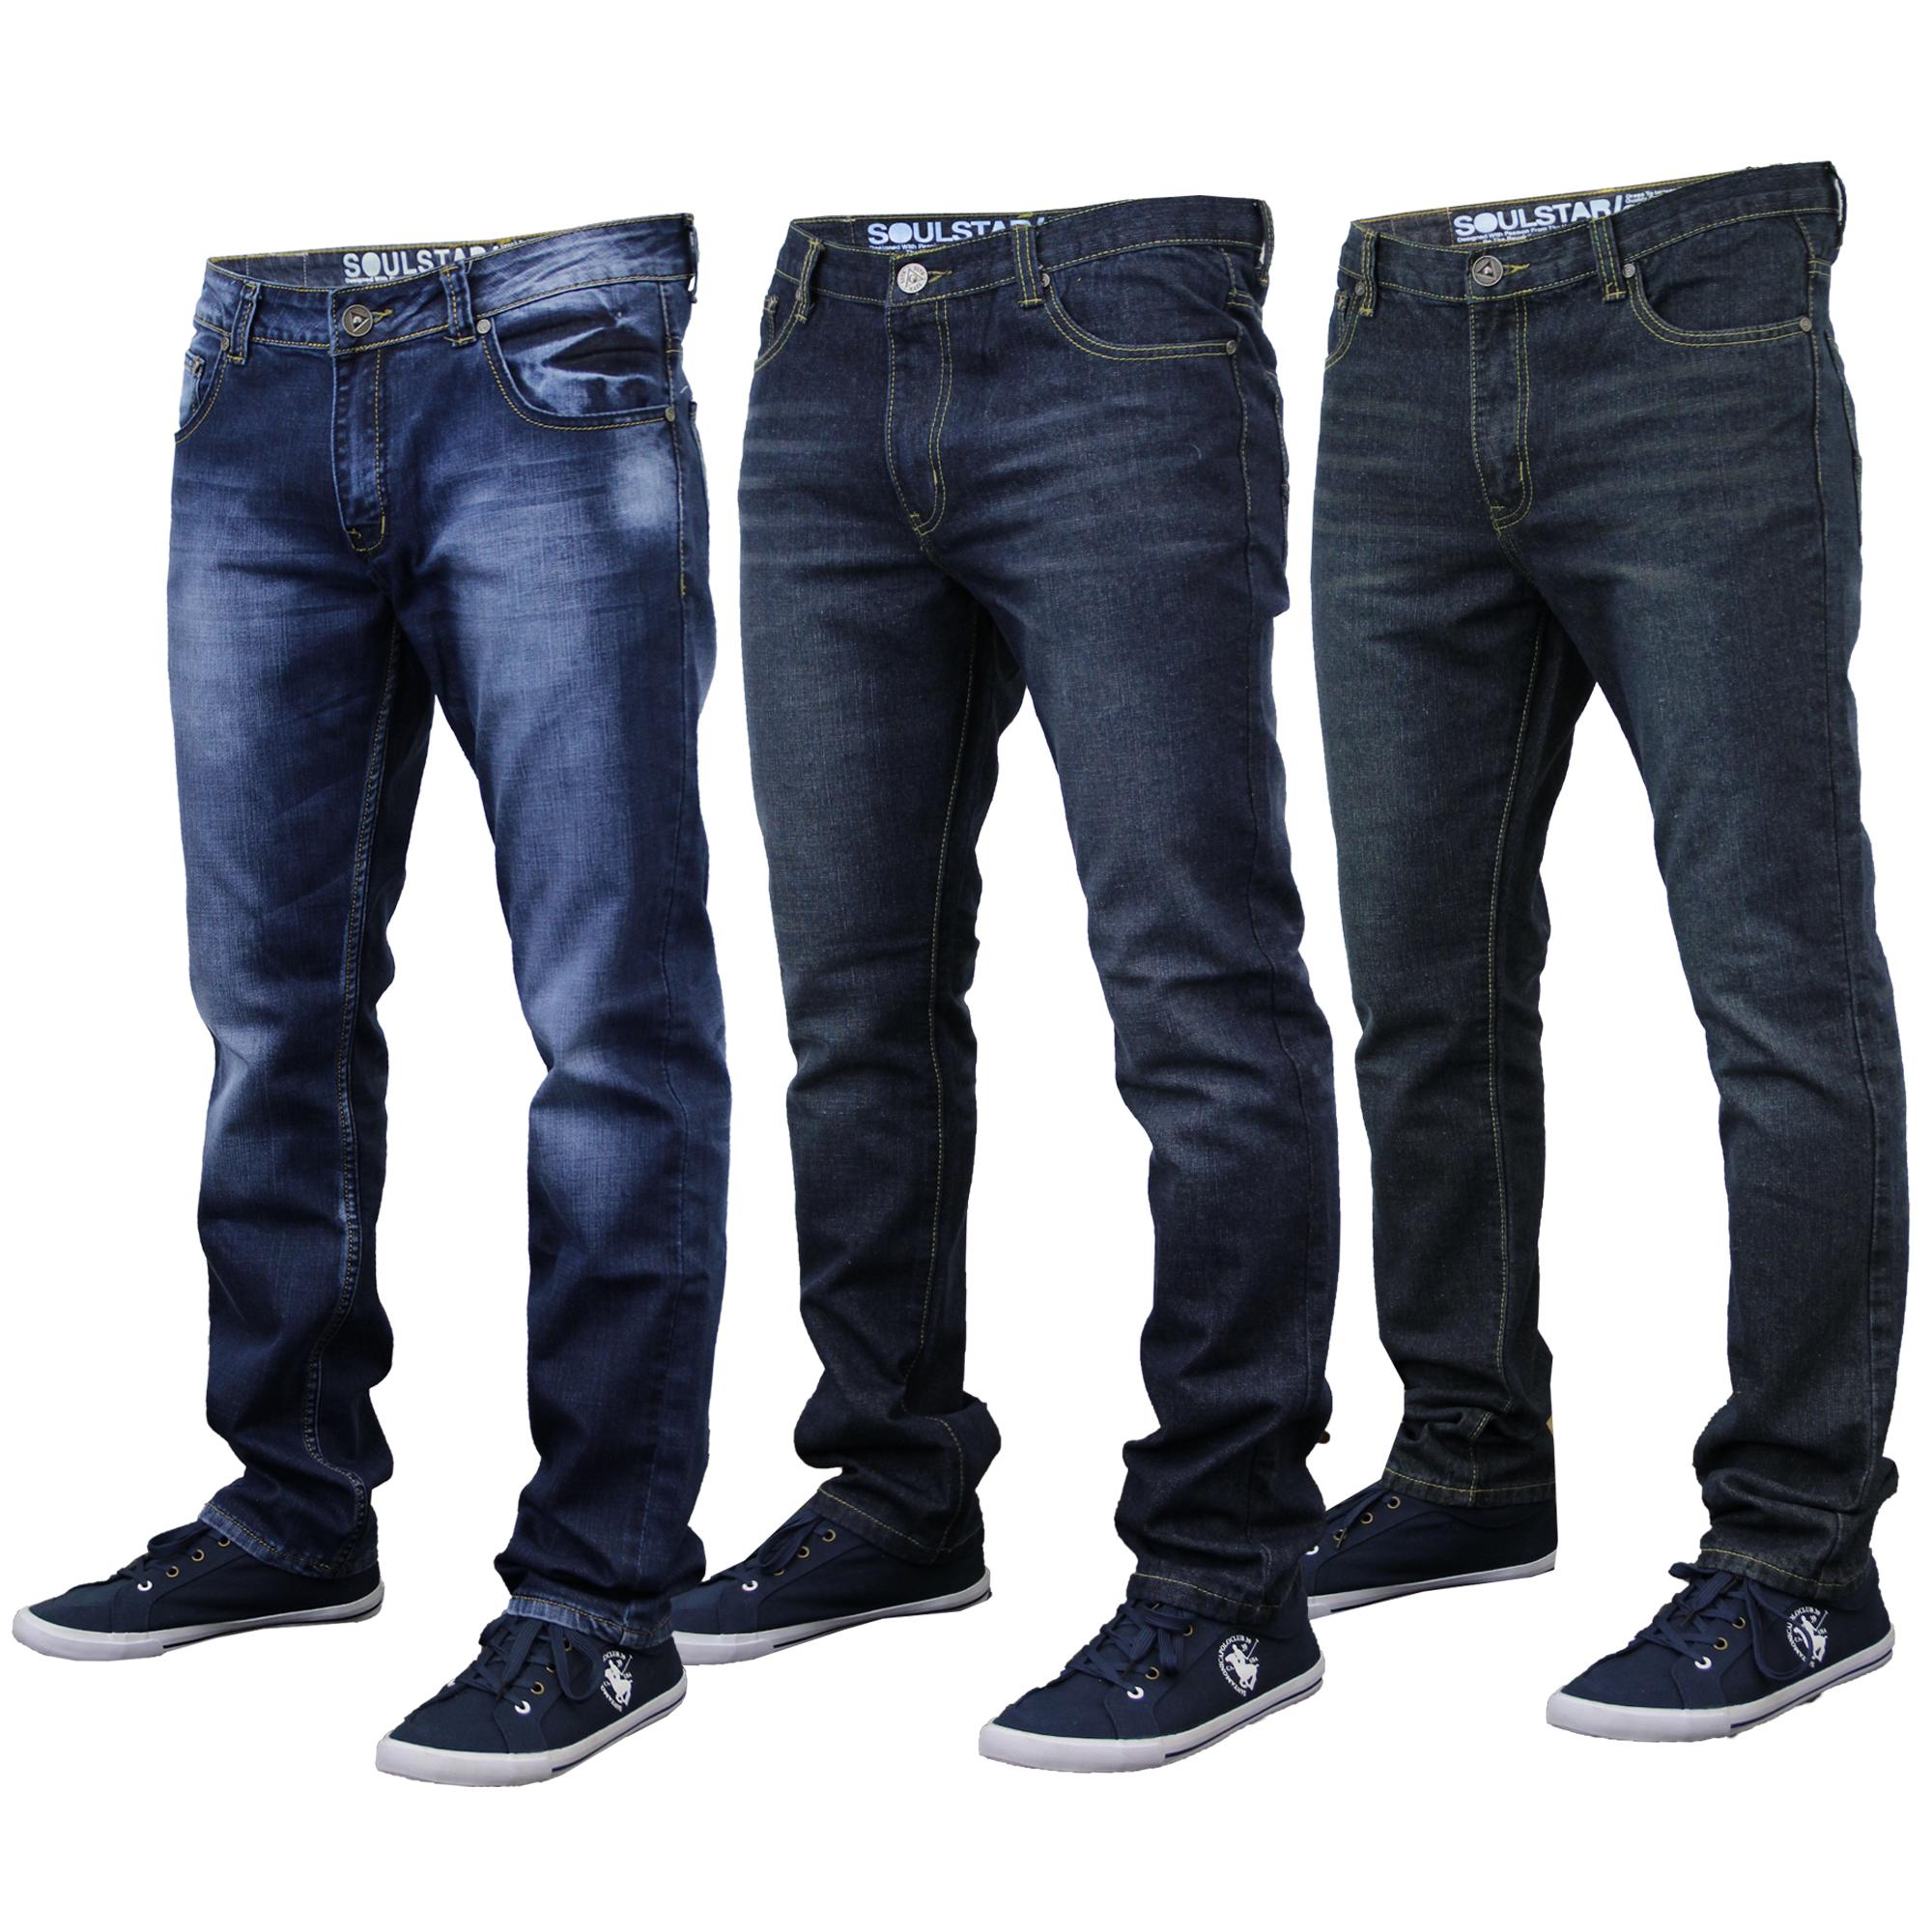 eccb9a0bff Mens Jeans Soul Star Denim Straight Fit Trousers Fashion Faded Dark ...